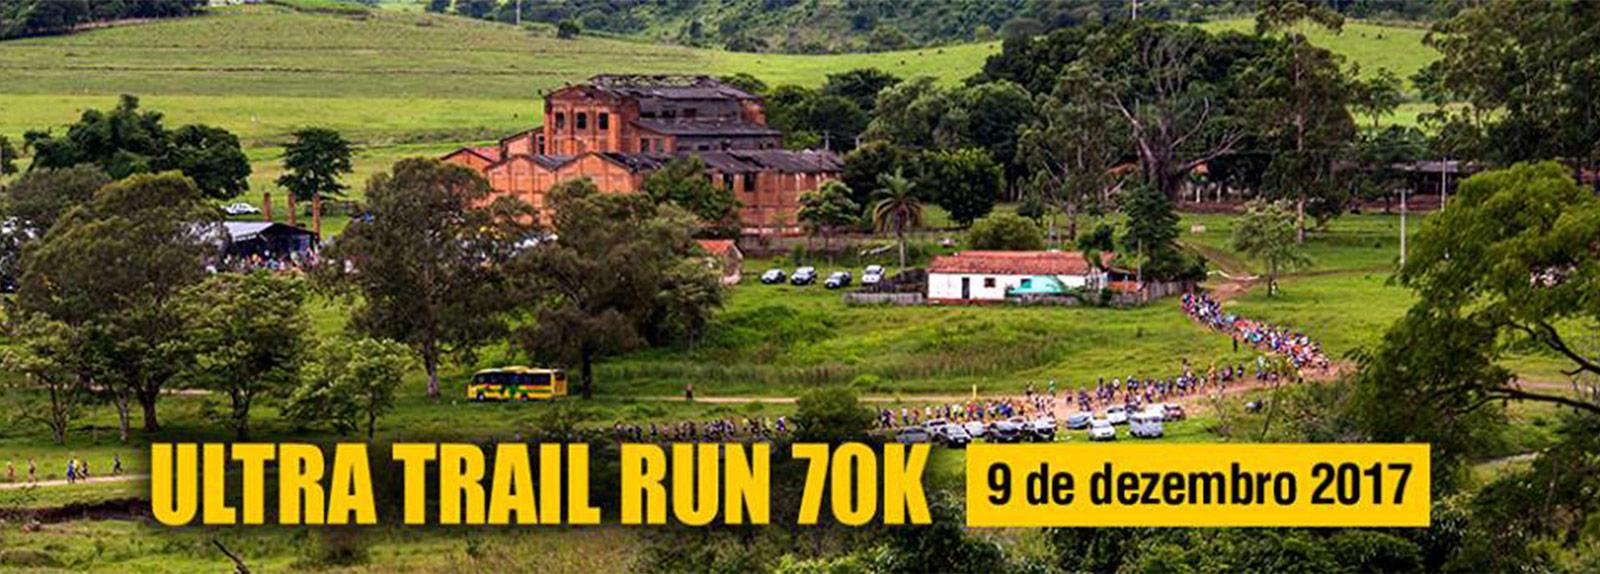 ULTRA TRAIL RUN 70K  - 2017 - Imagem de topo